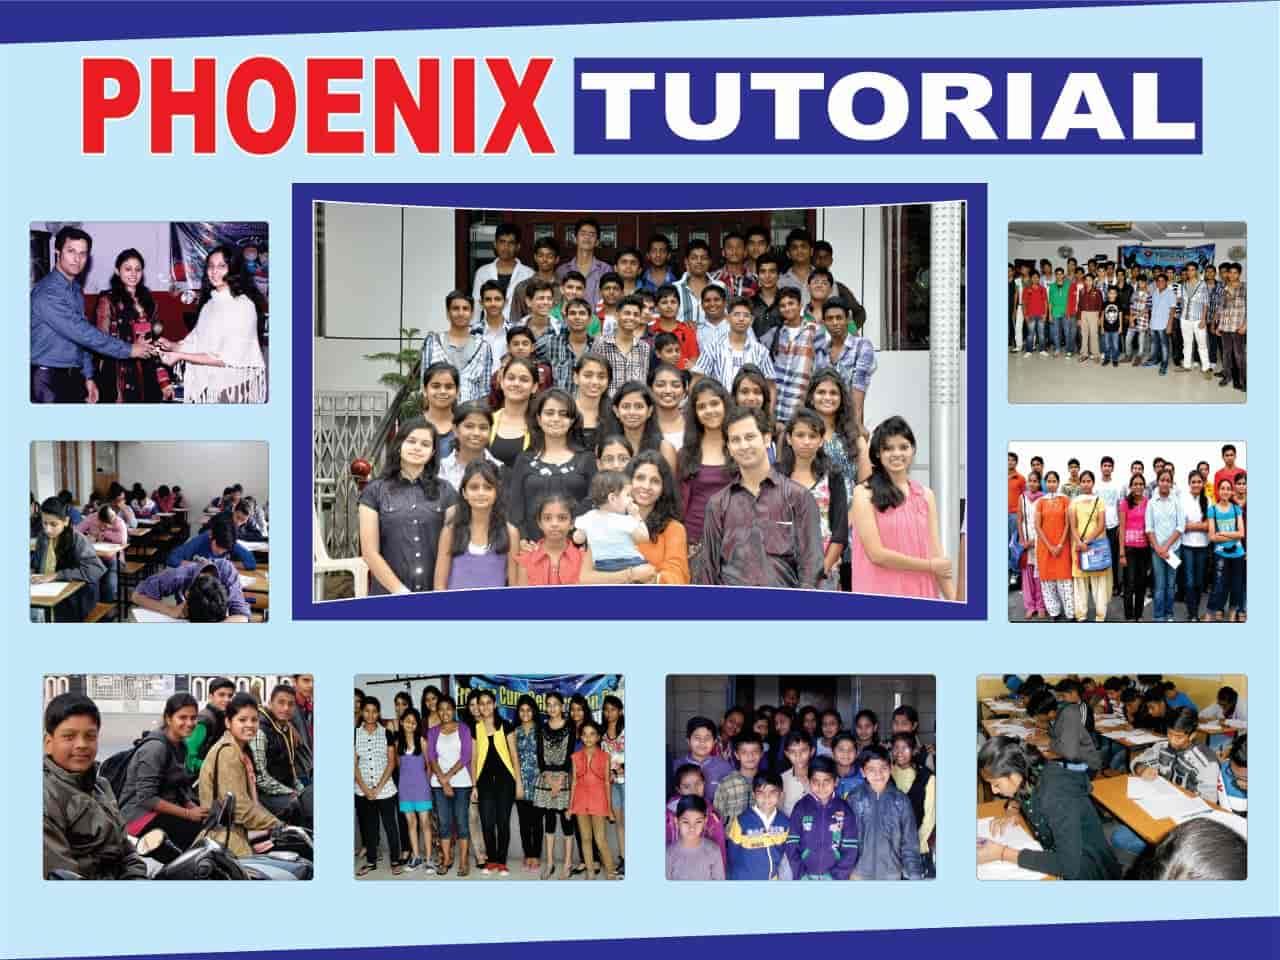 Phoenix Tutorial, Hiran Magri - Tutorials in Udaipur